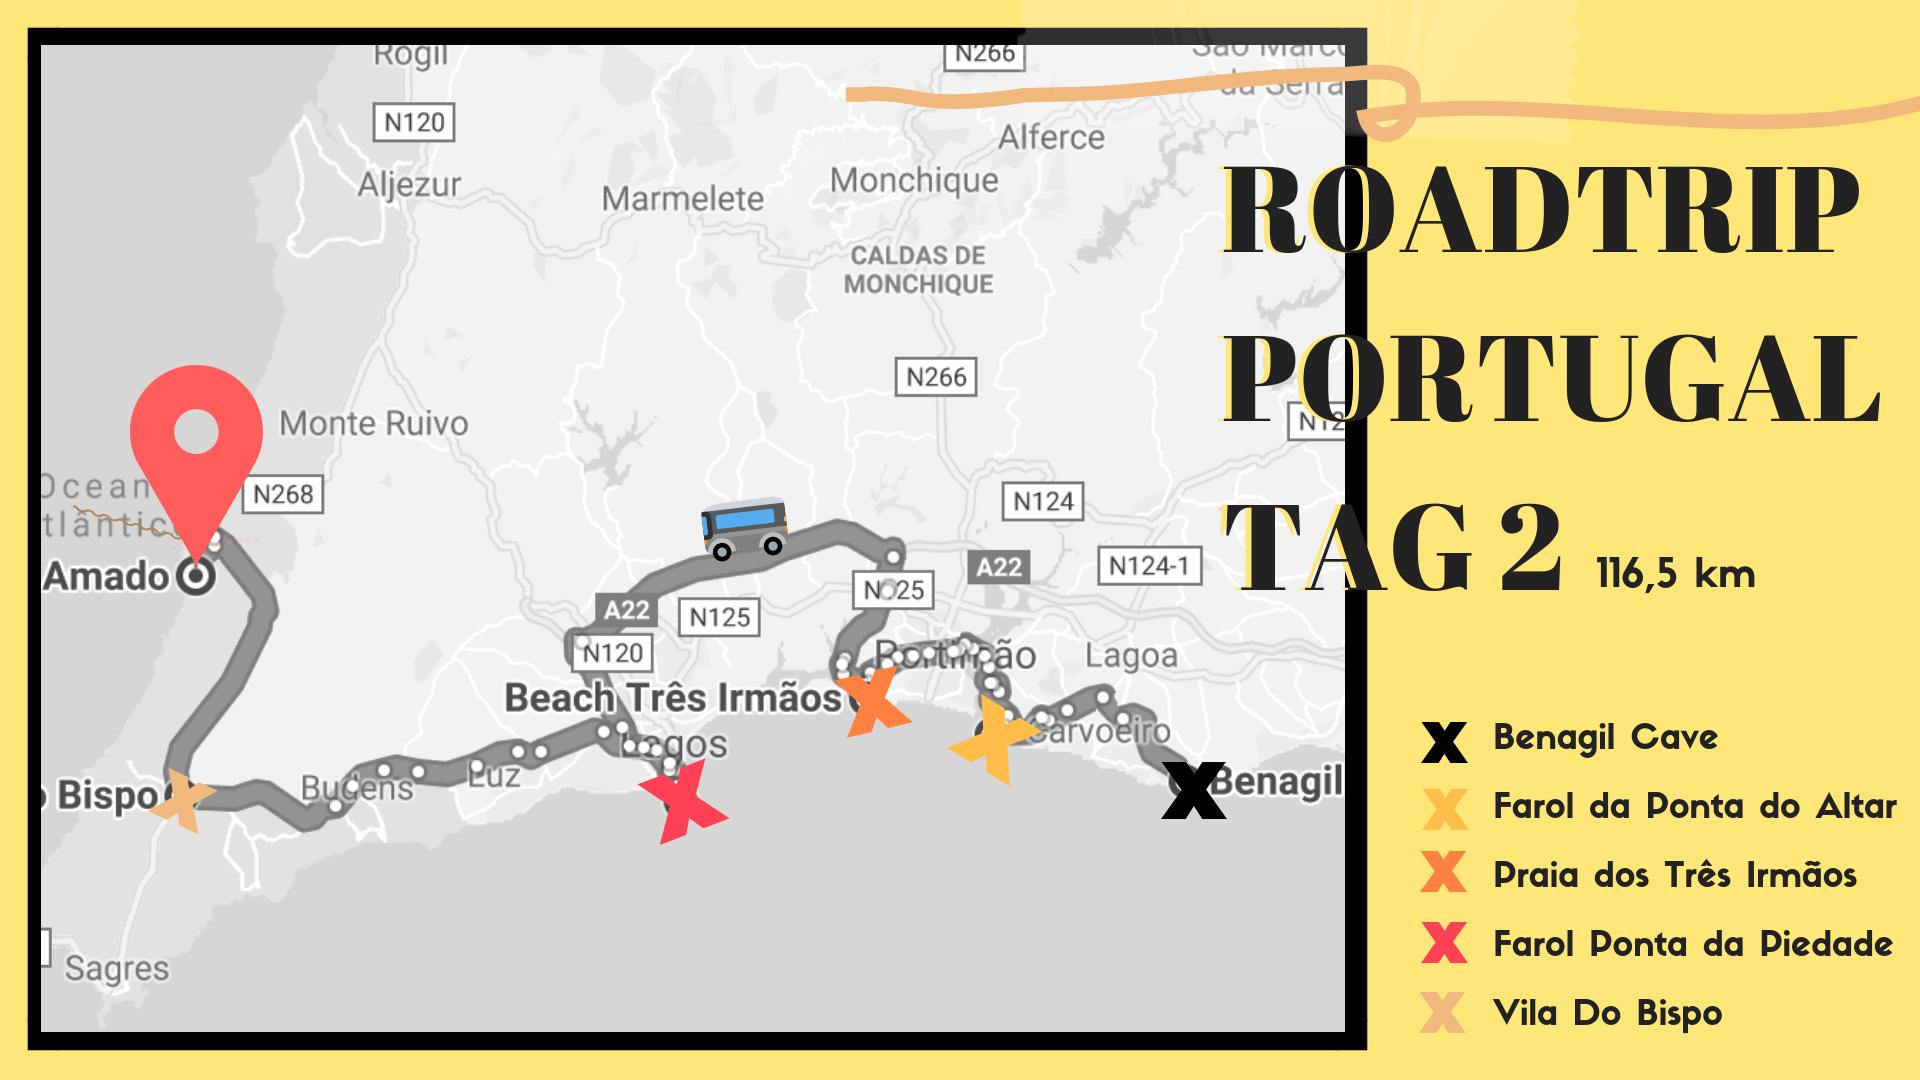 Roadtrip Portugal, Route Tag 2, 20